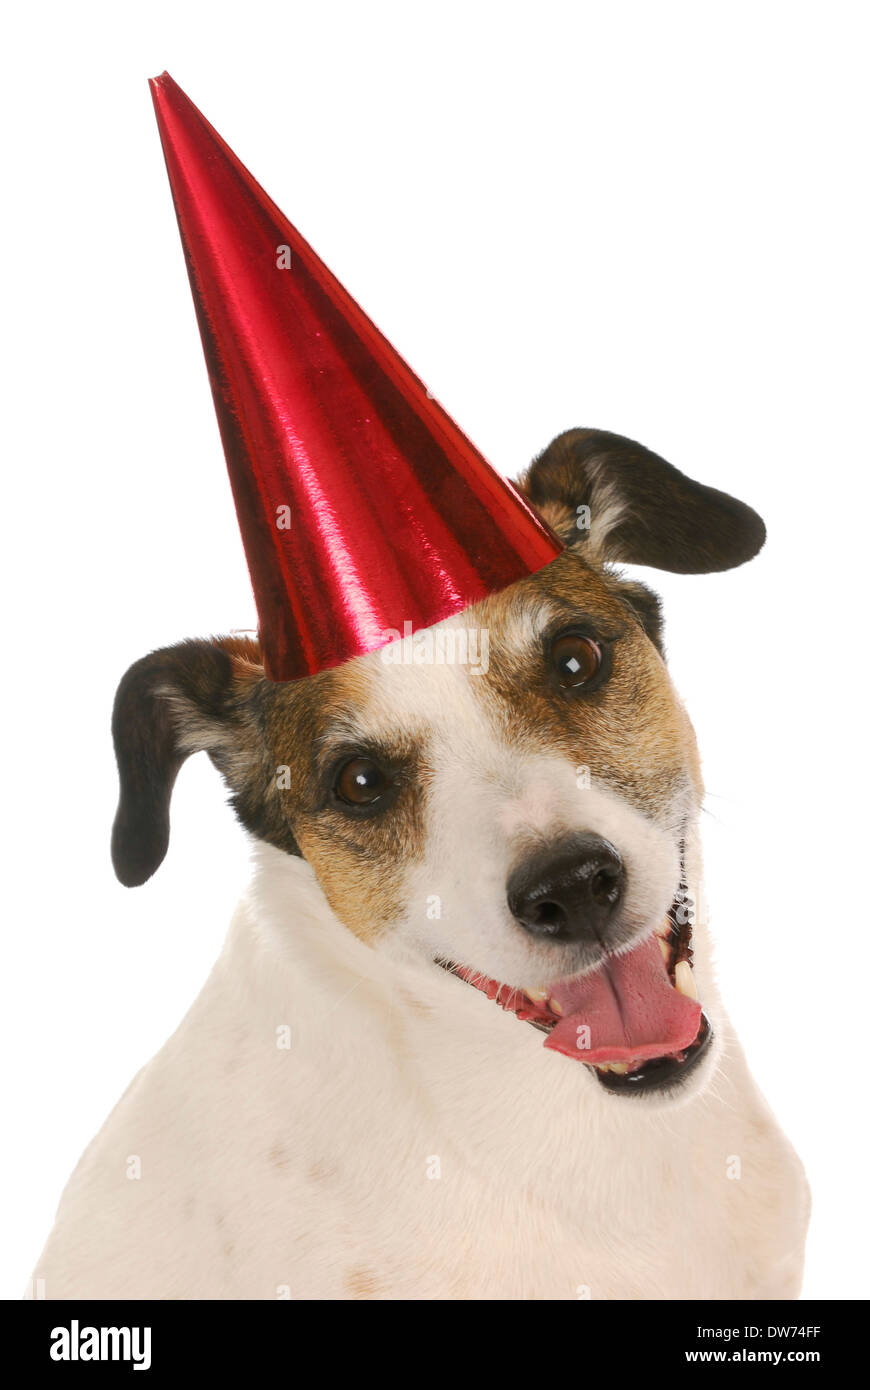 Joyeux Anniversaire Chien Jack Russel Terrier Wearing Red Birthday